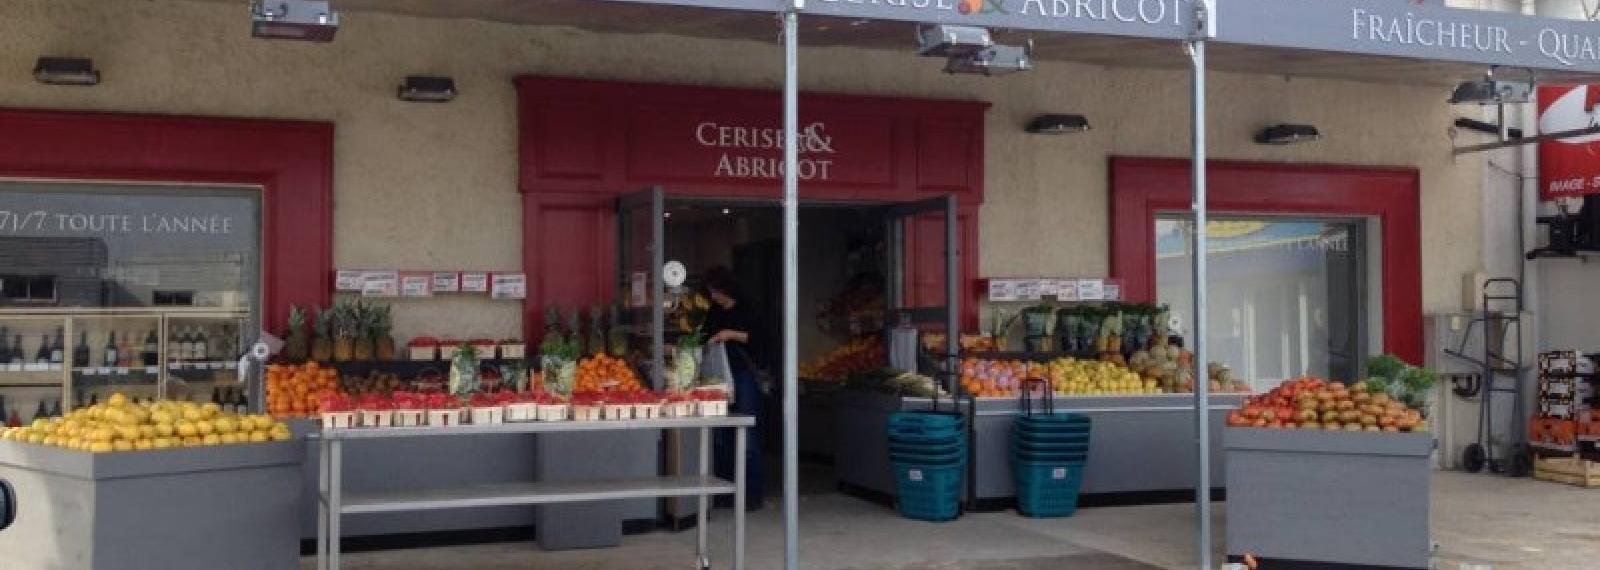 Cerise & Abricot